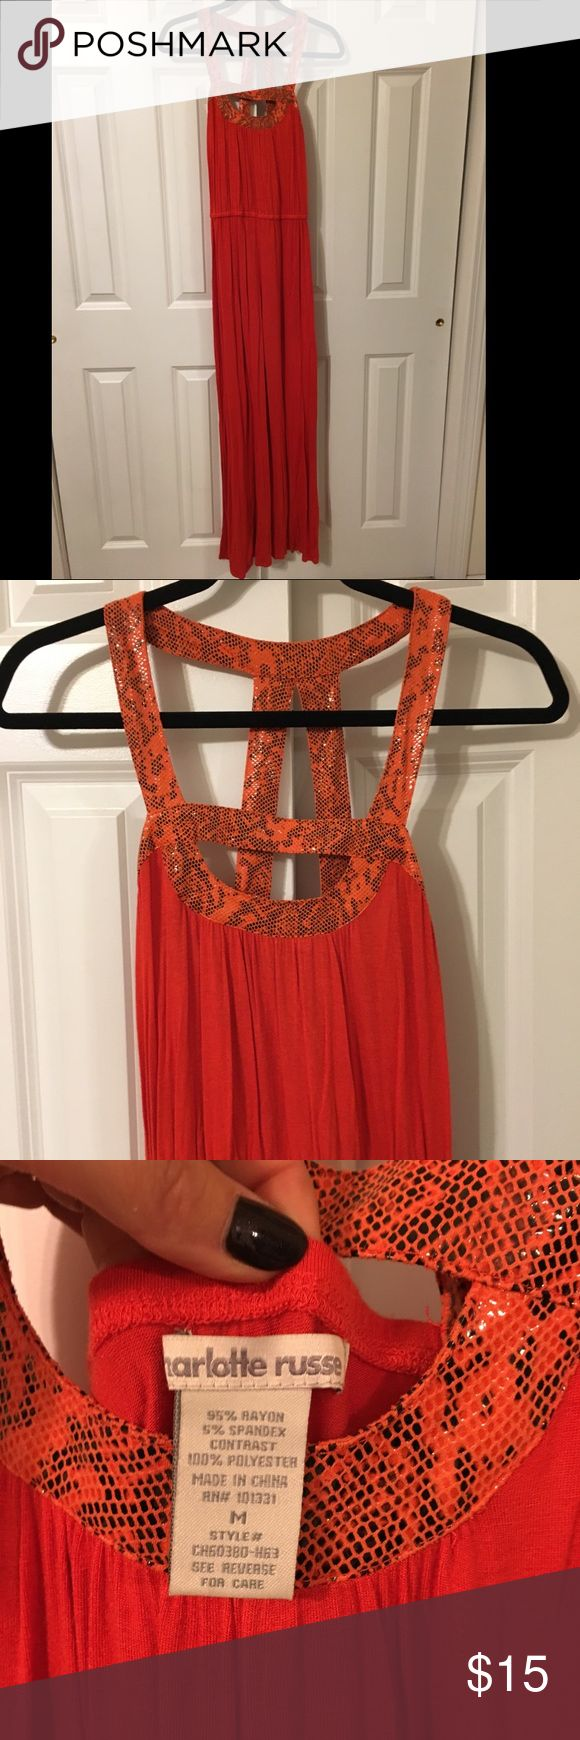 Orange maxi dress with snake print detail straps Orange maxi dress with snake print detail straps Charlotte Russe Dresses Maxi